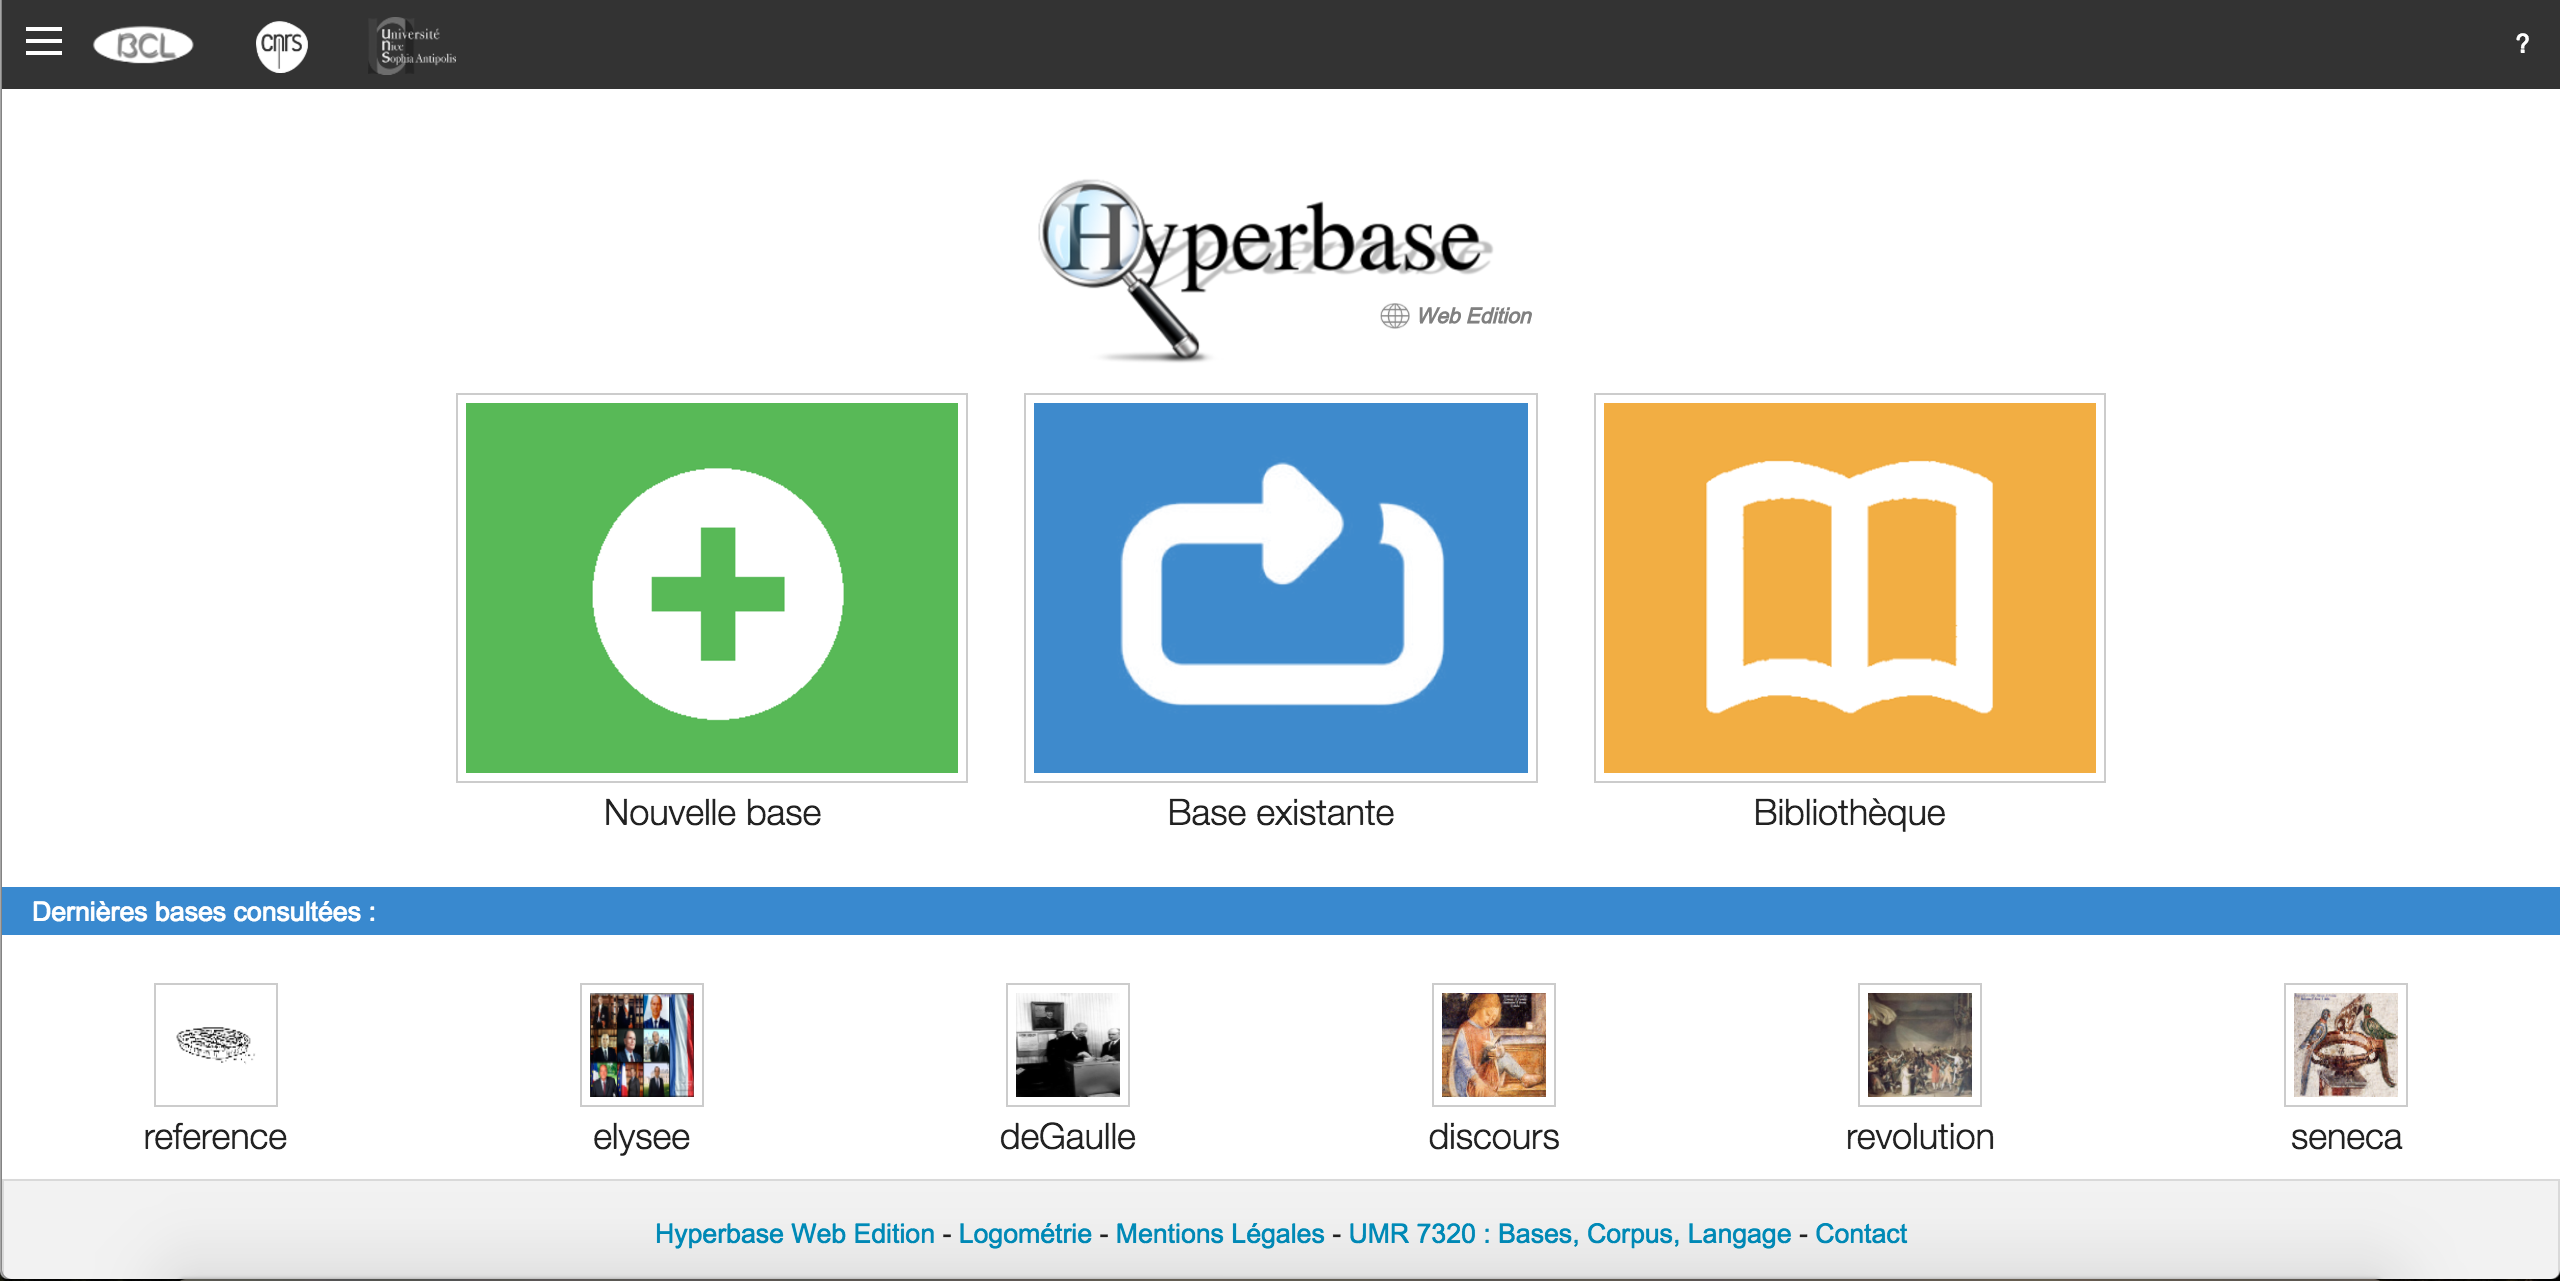 Hyperbase Web